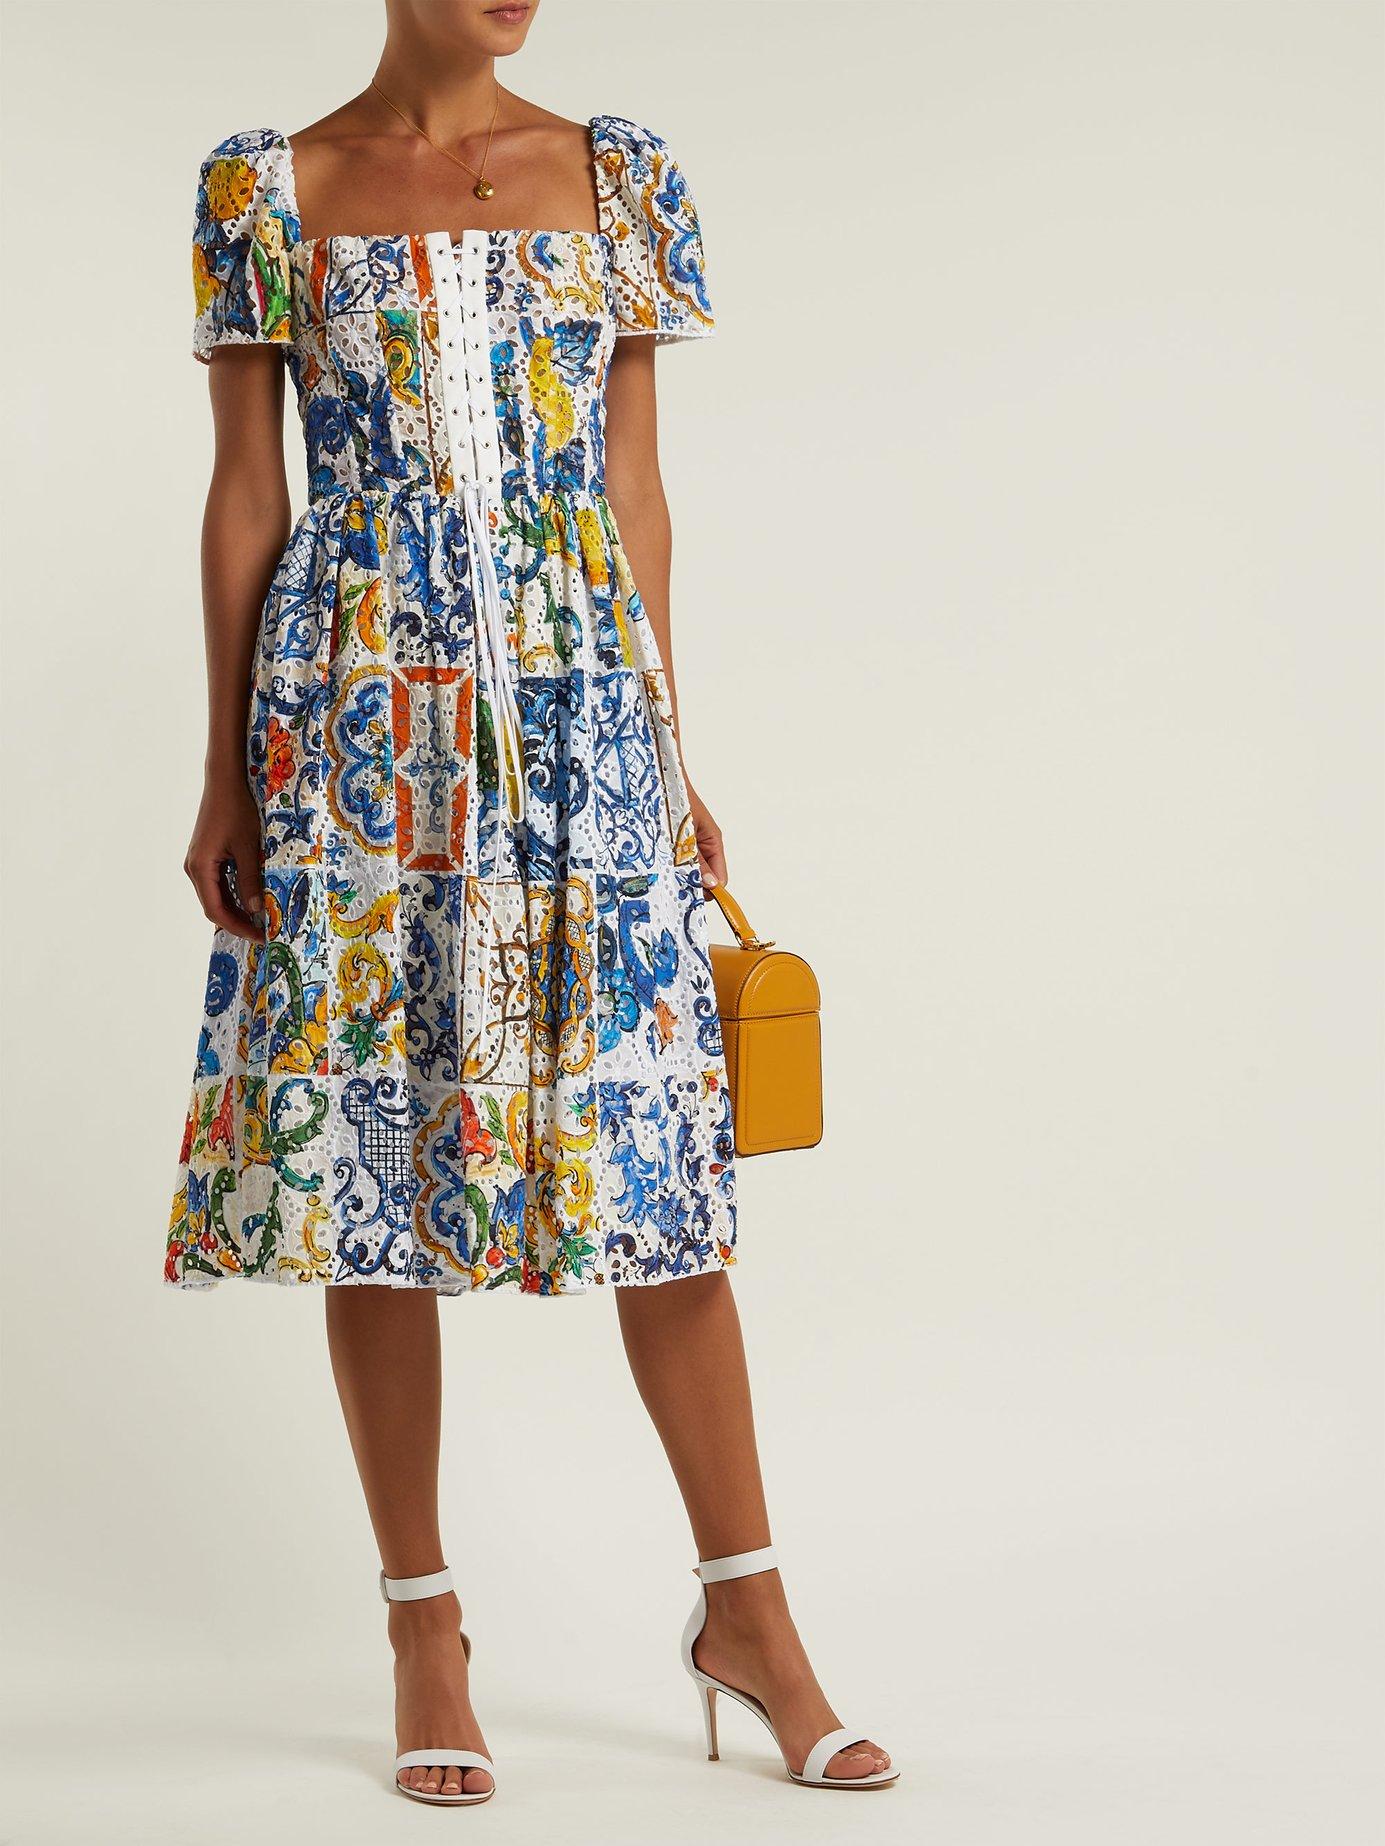 Majolica-print cotton broderie-anglaise midi dress by Dolce & Gabbana